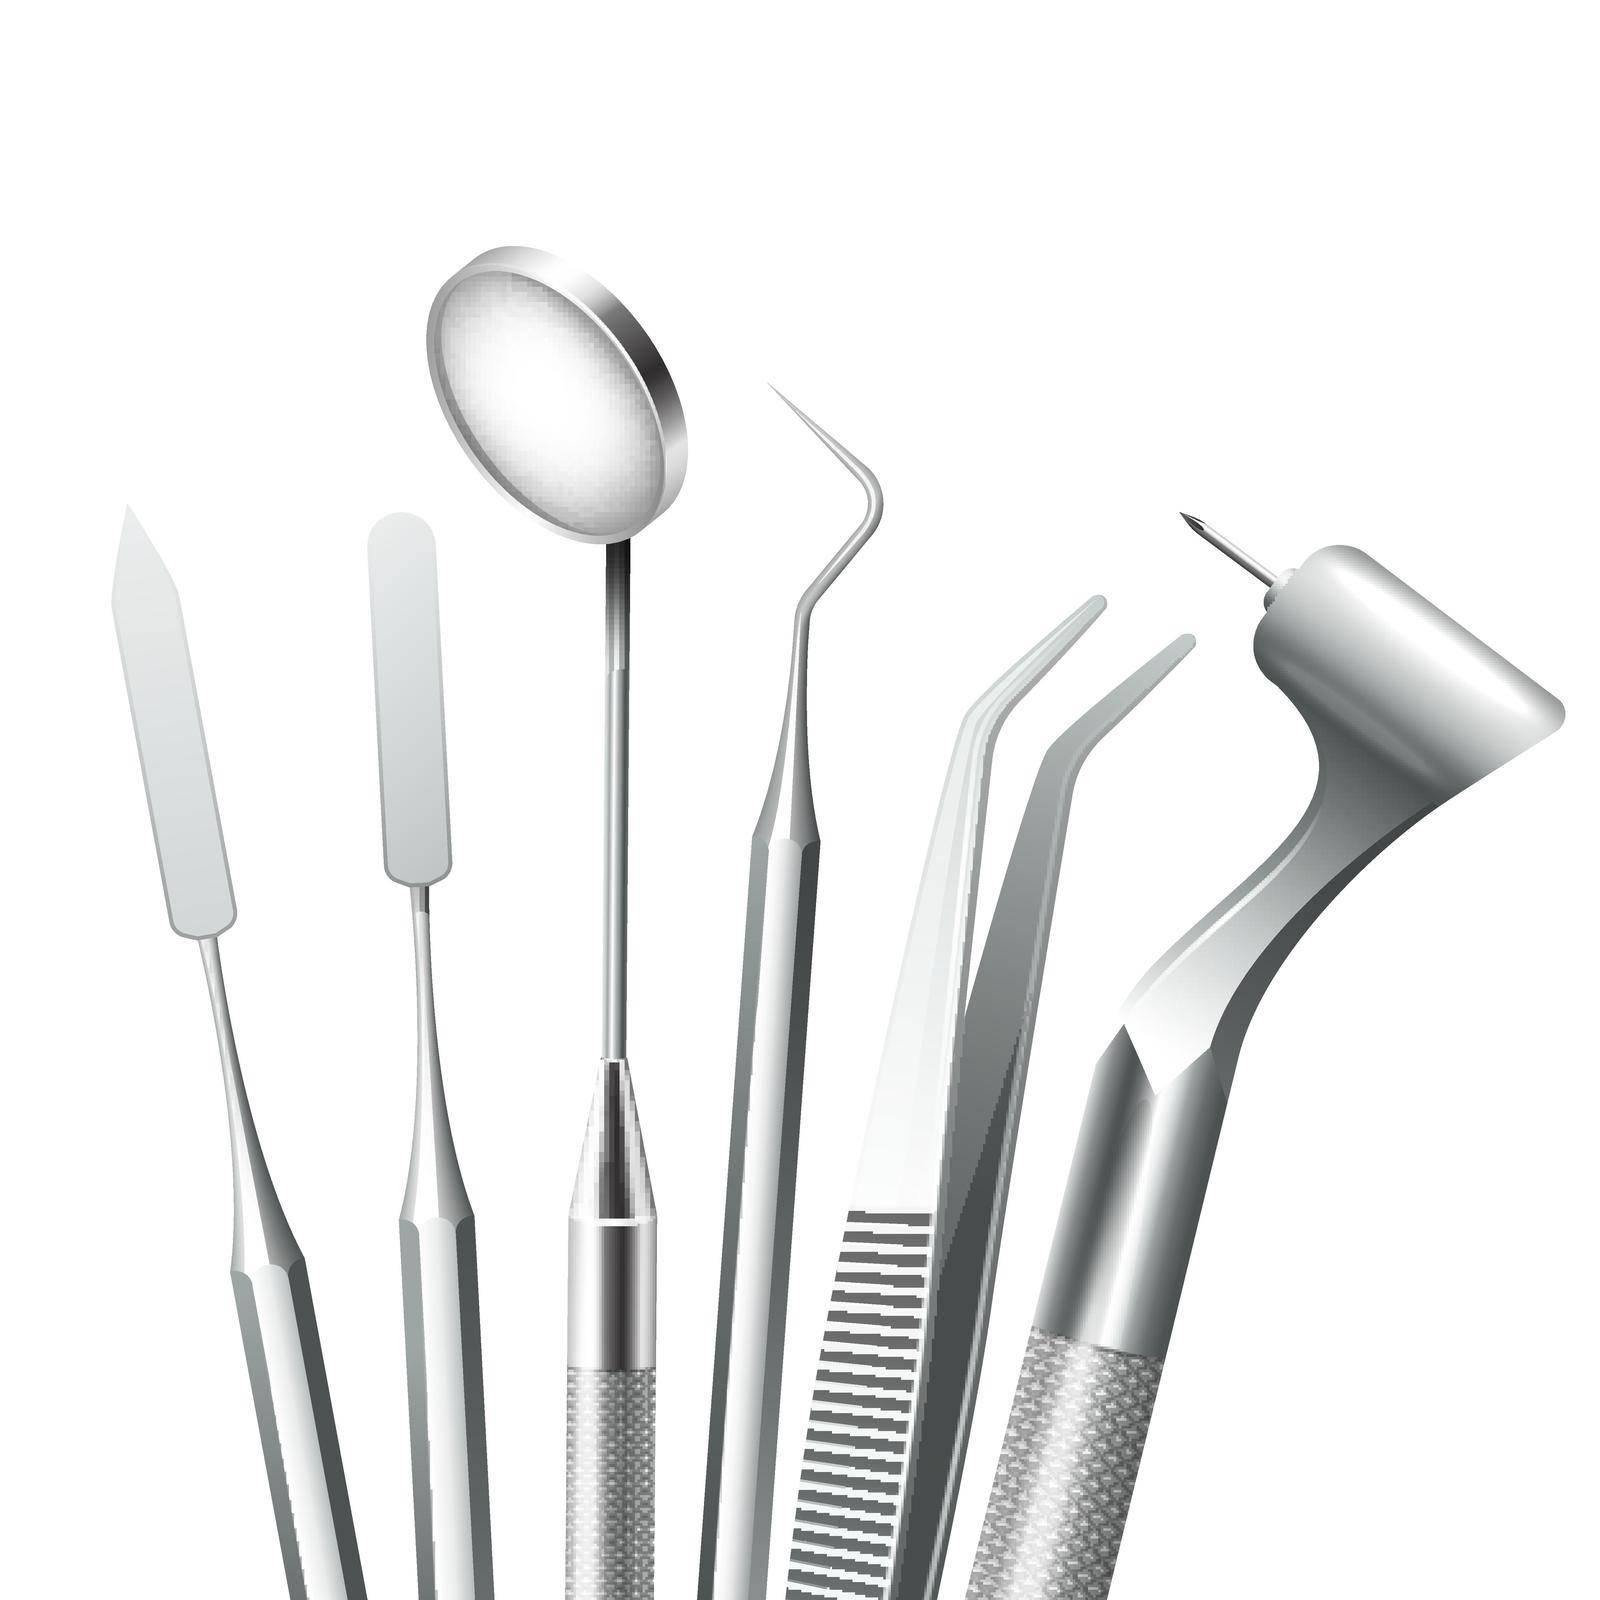 Teeth dental medical equipment steel tools set realistic vector illustration